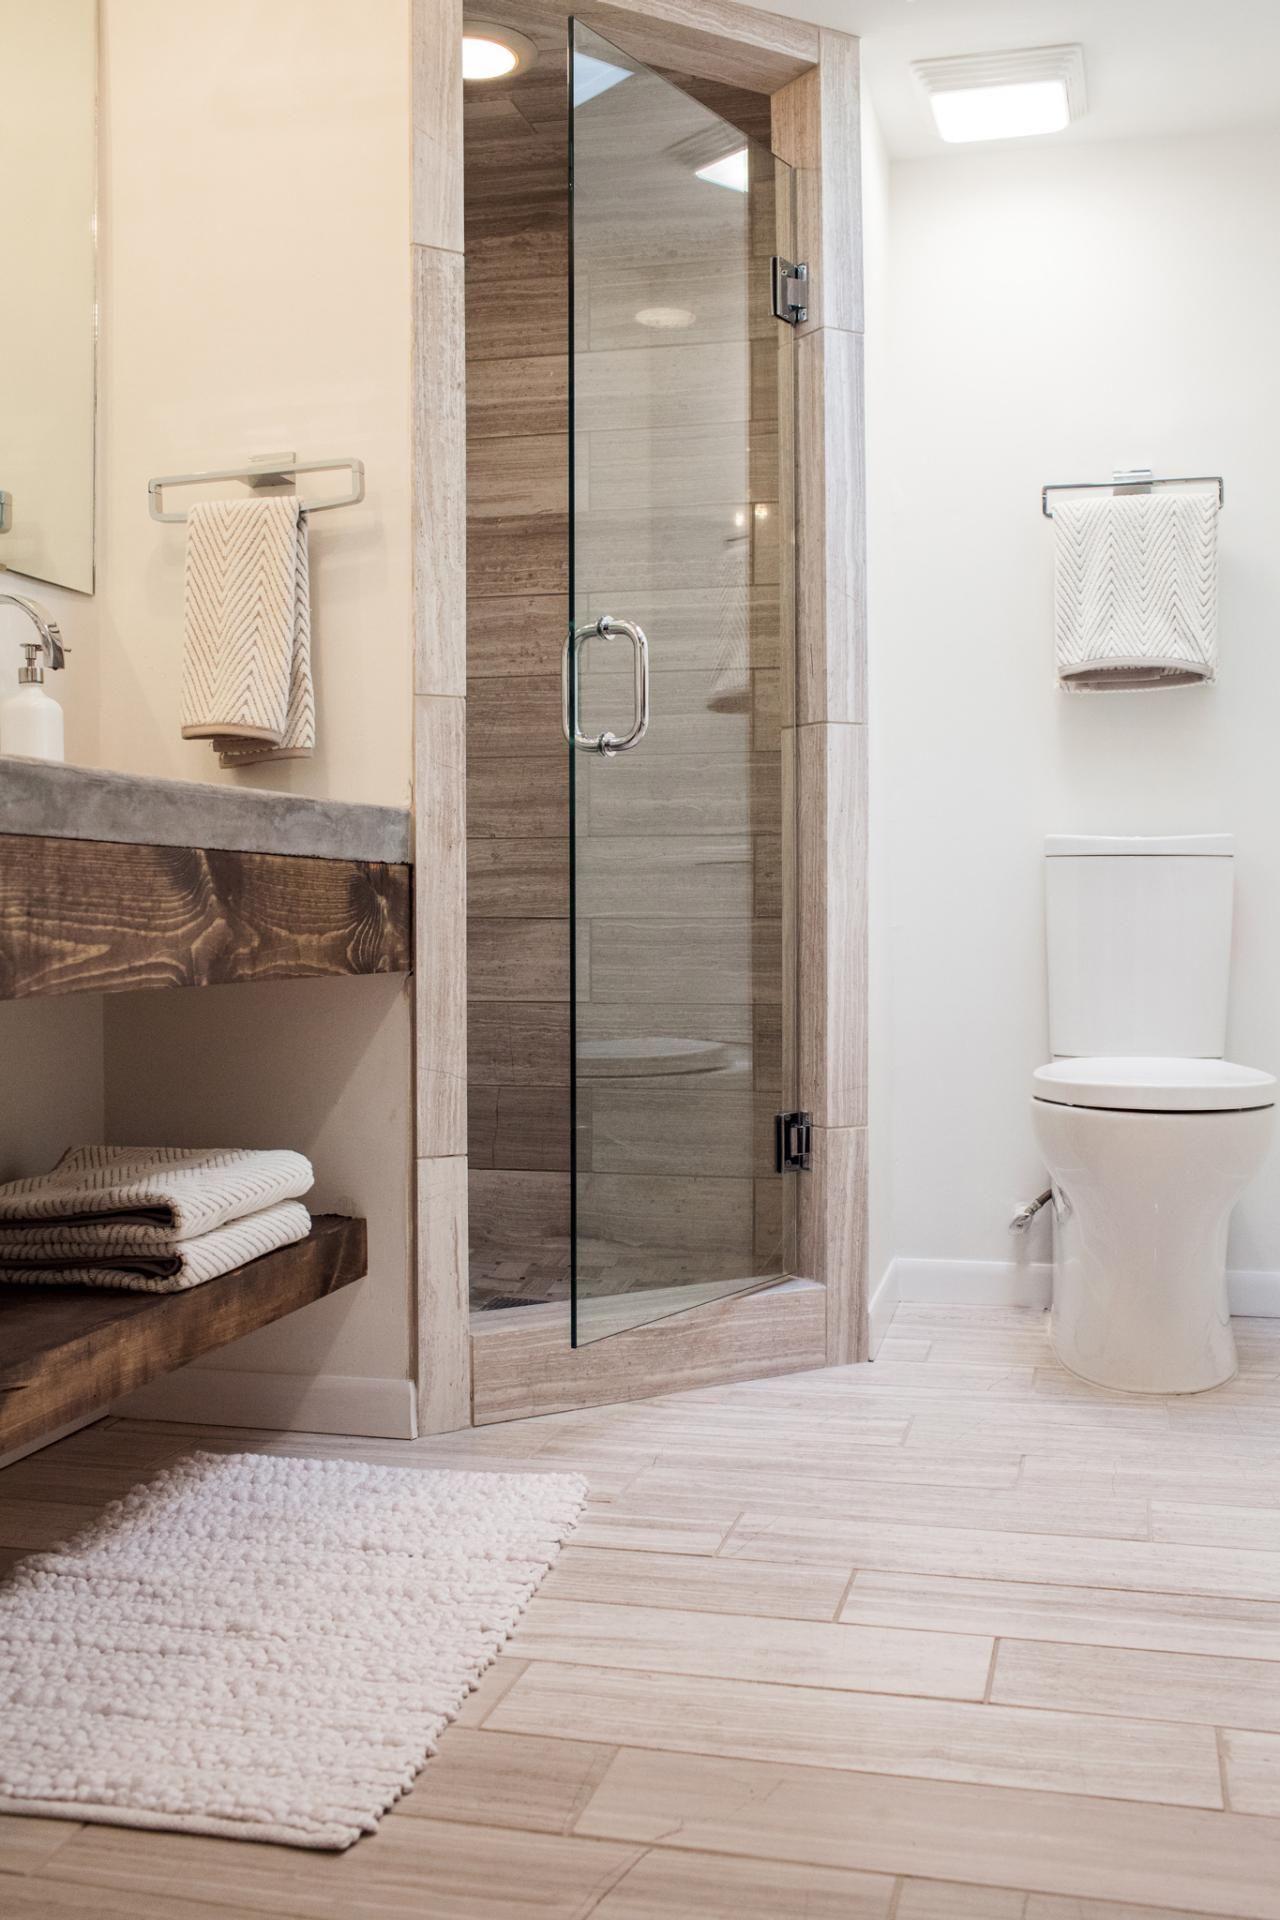 e71b54eac163 shower doors glass shower doors home depot shower doors shower doors home  depot shower doors in home depot lowes shower doors shower doors lowes  corner ...